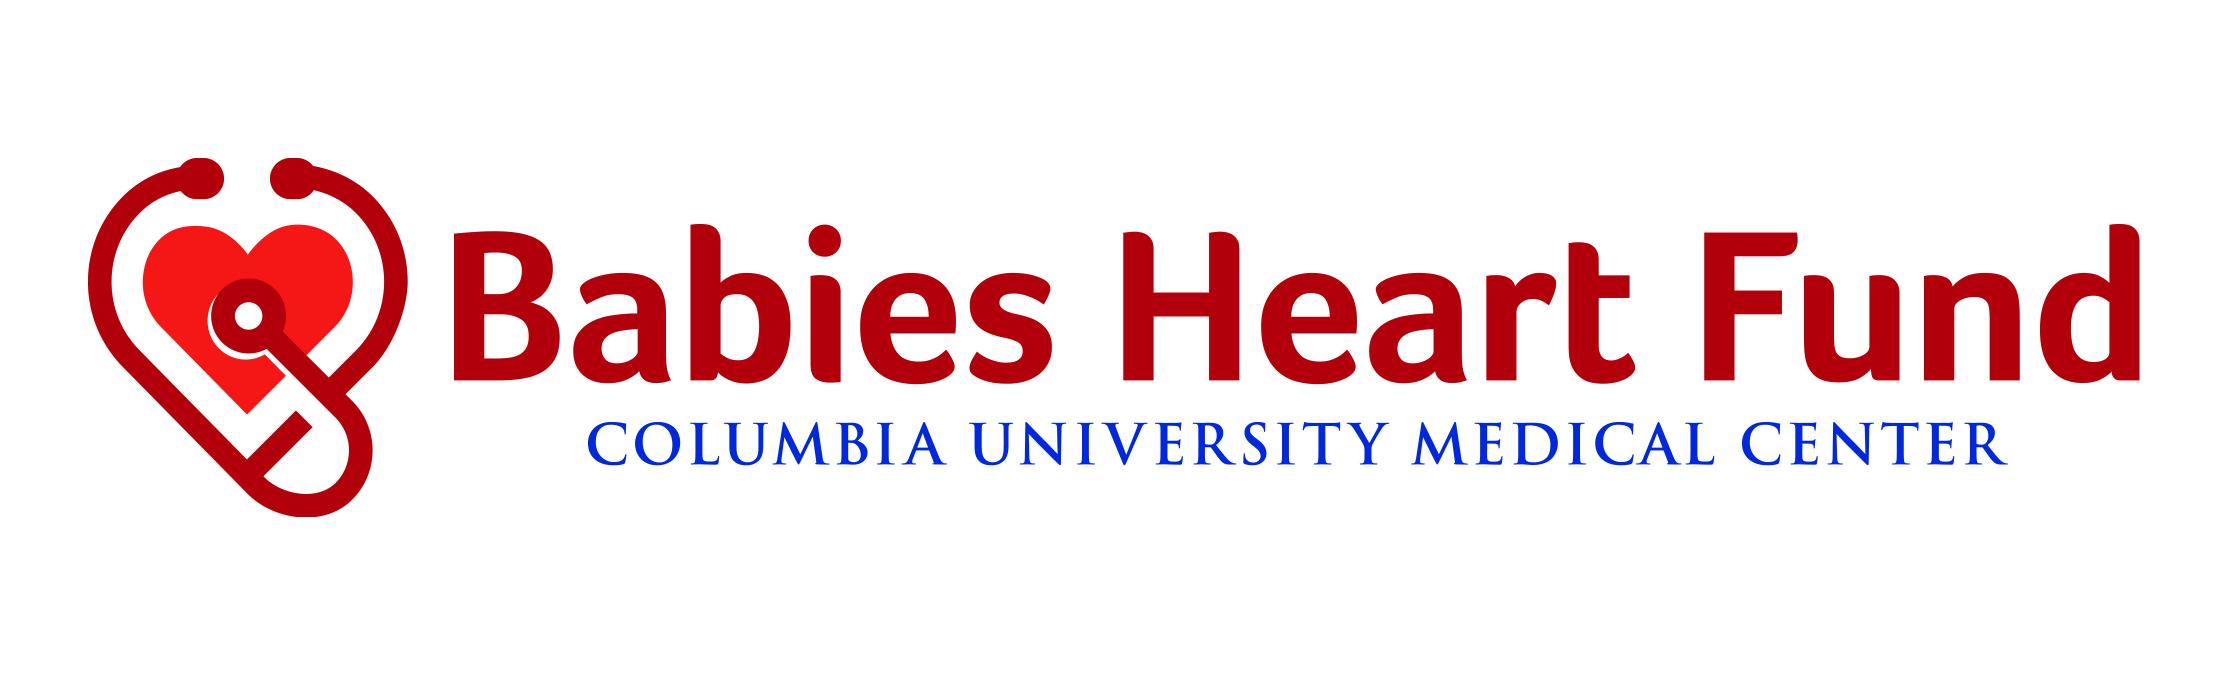 Babies Heart Fund